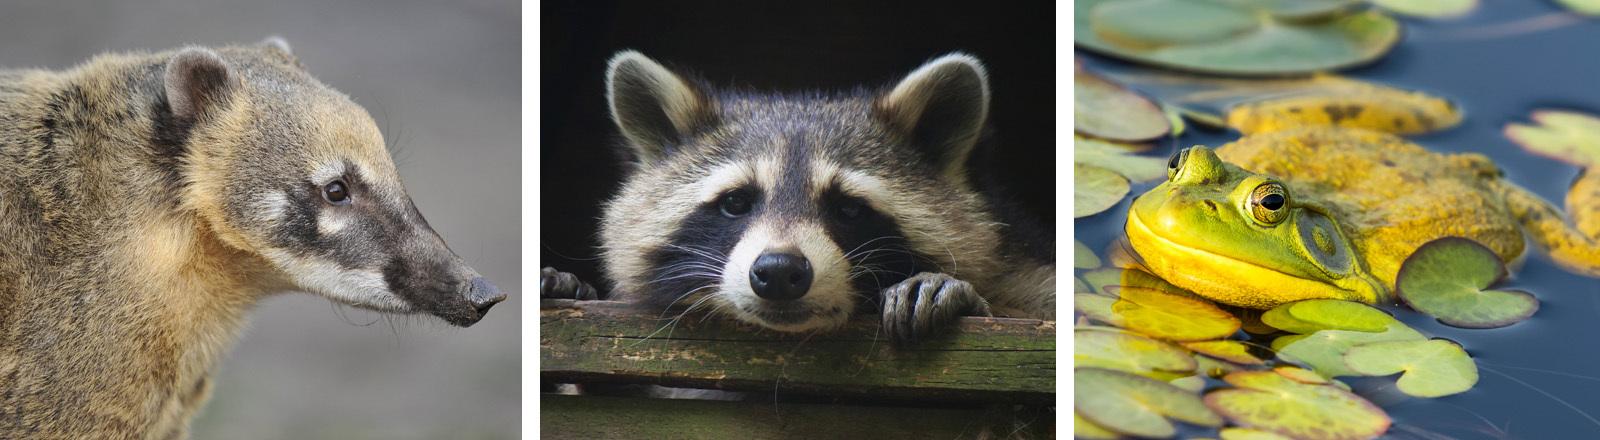 Invasive Arten: Südamerikanischer Nasenbär, Waschbär, Ochsenfrosch